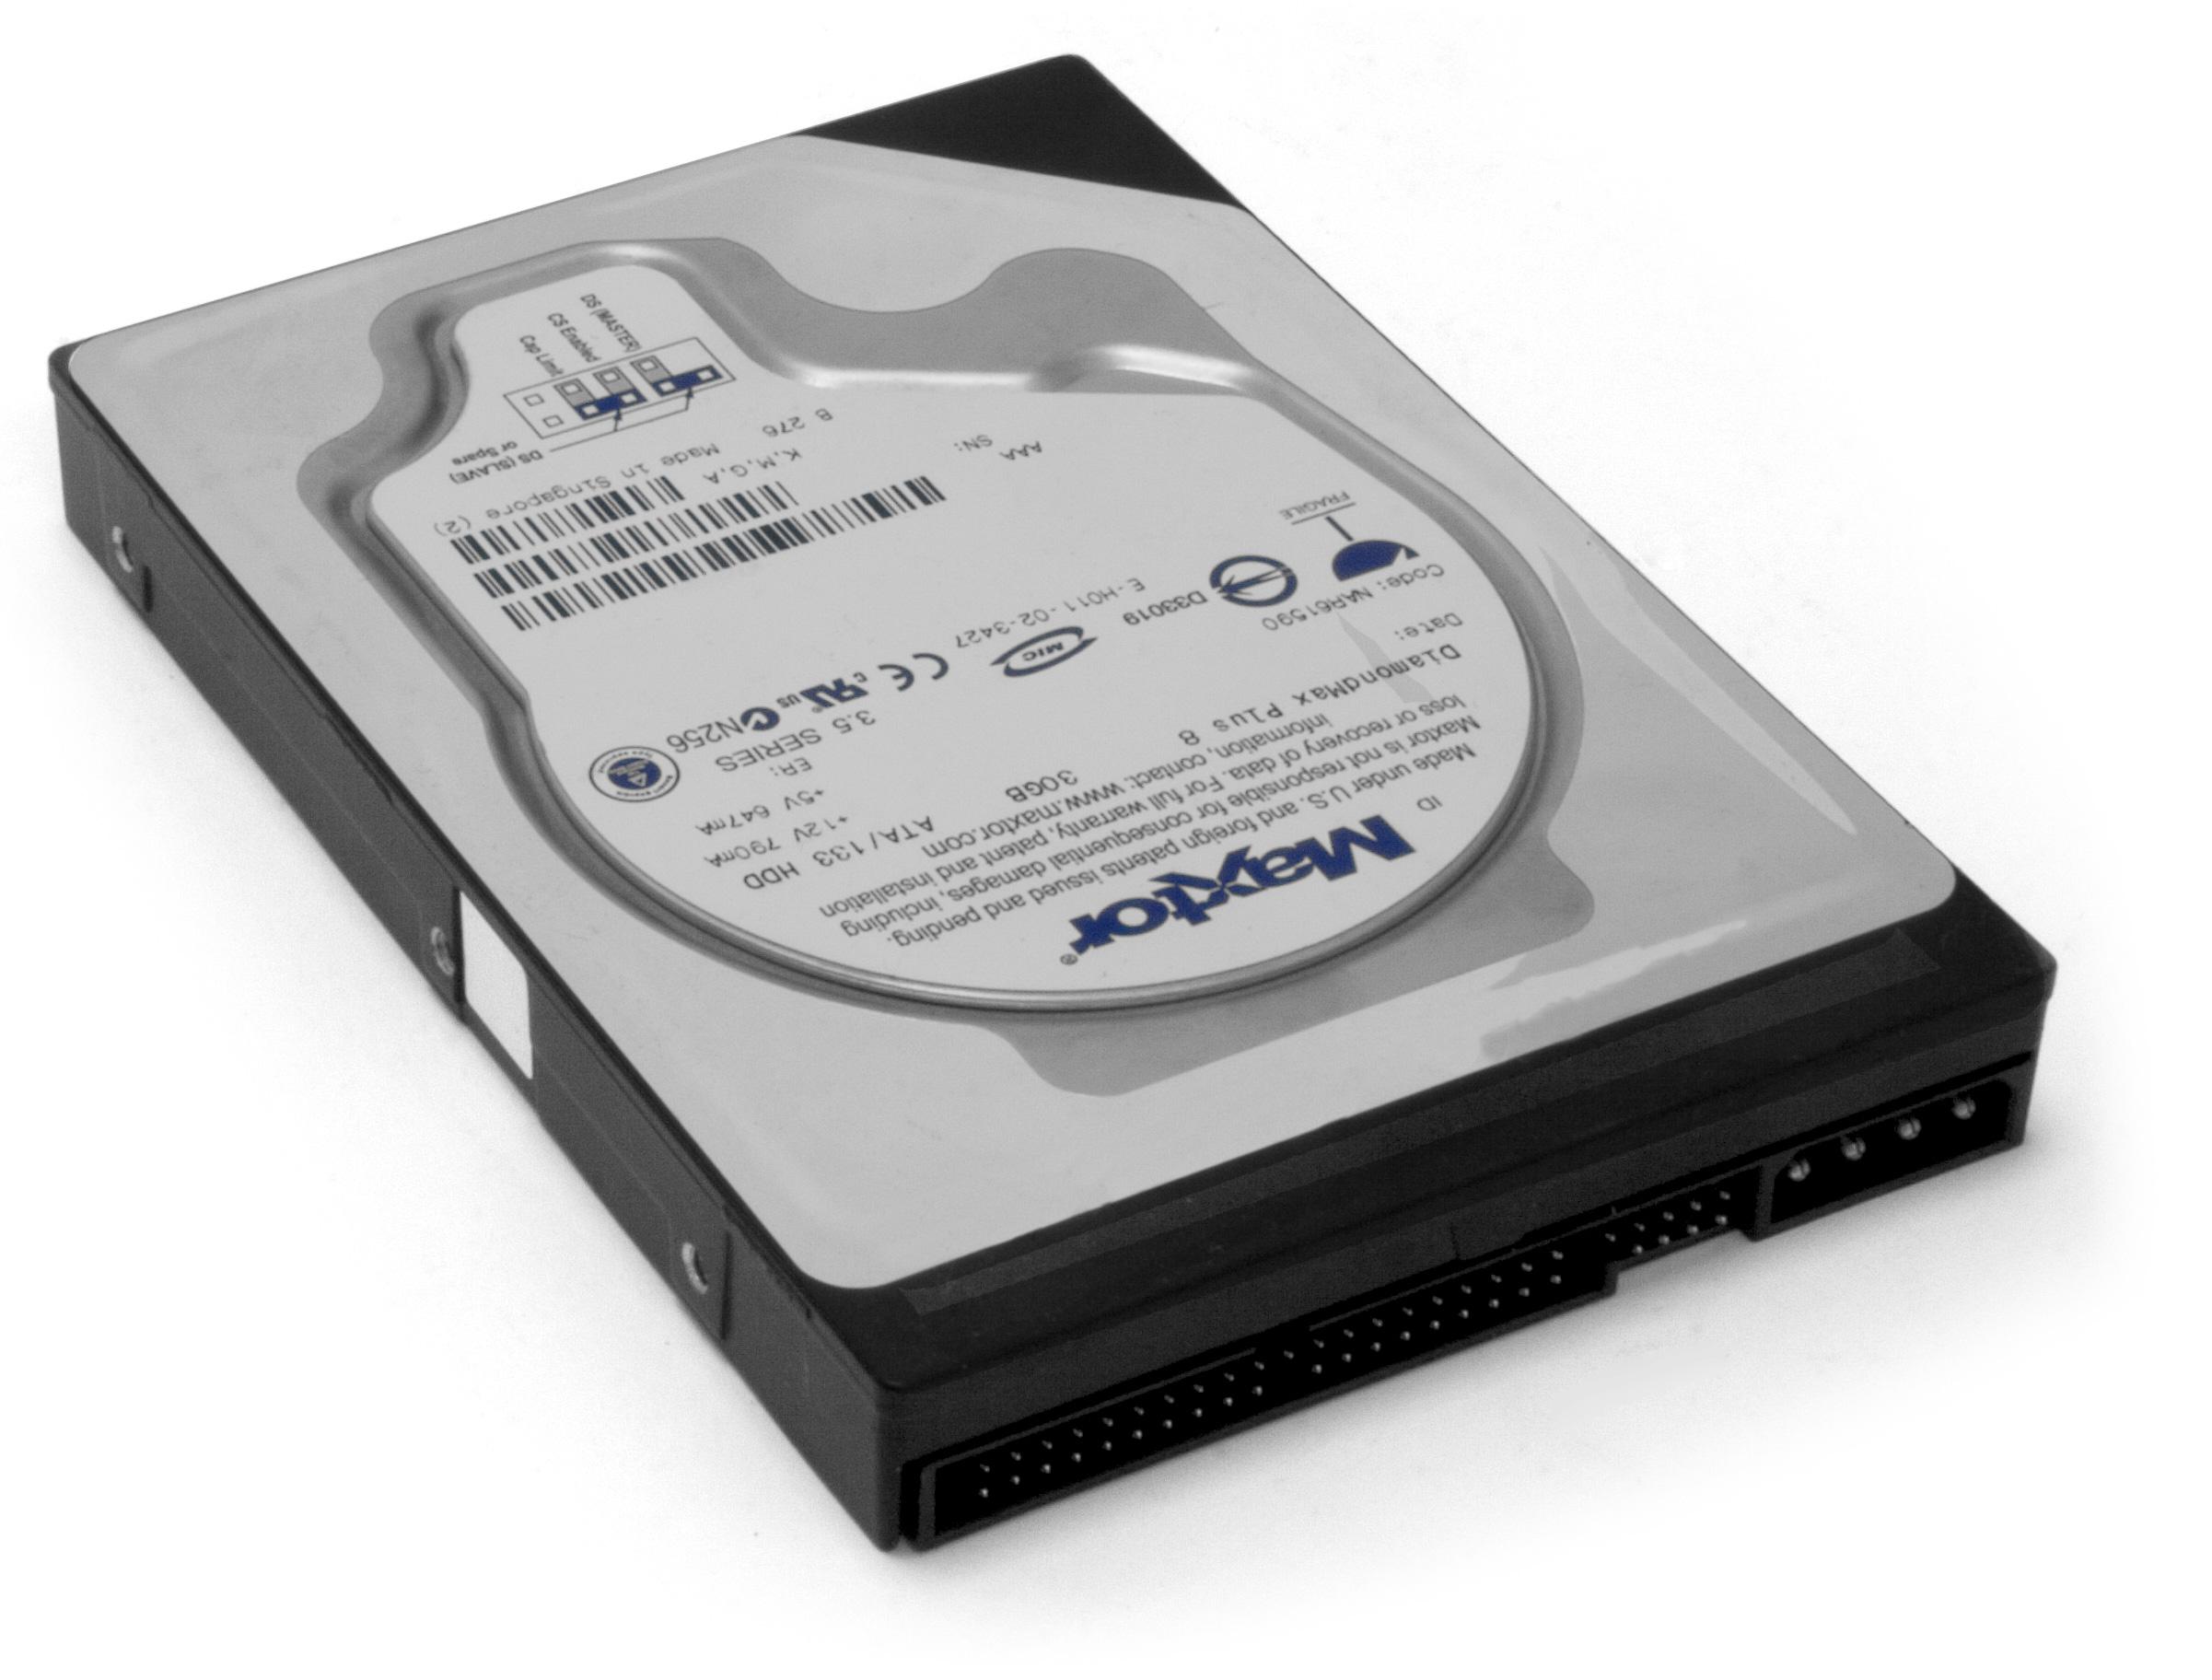 Maxtor hard drive is an obsolete hard drive brand